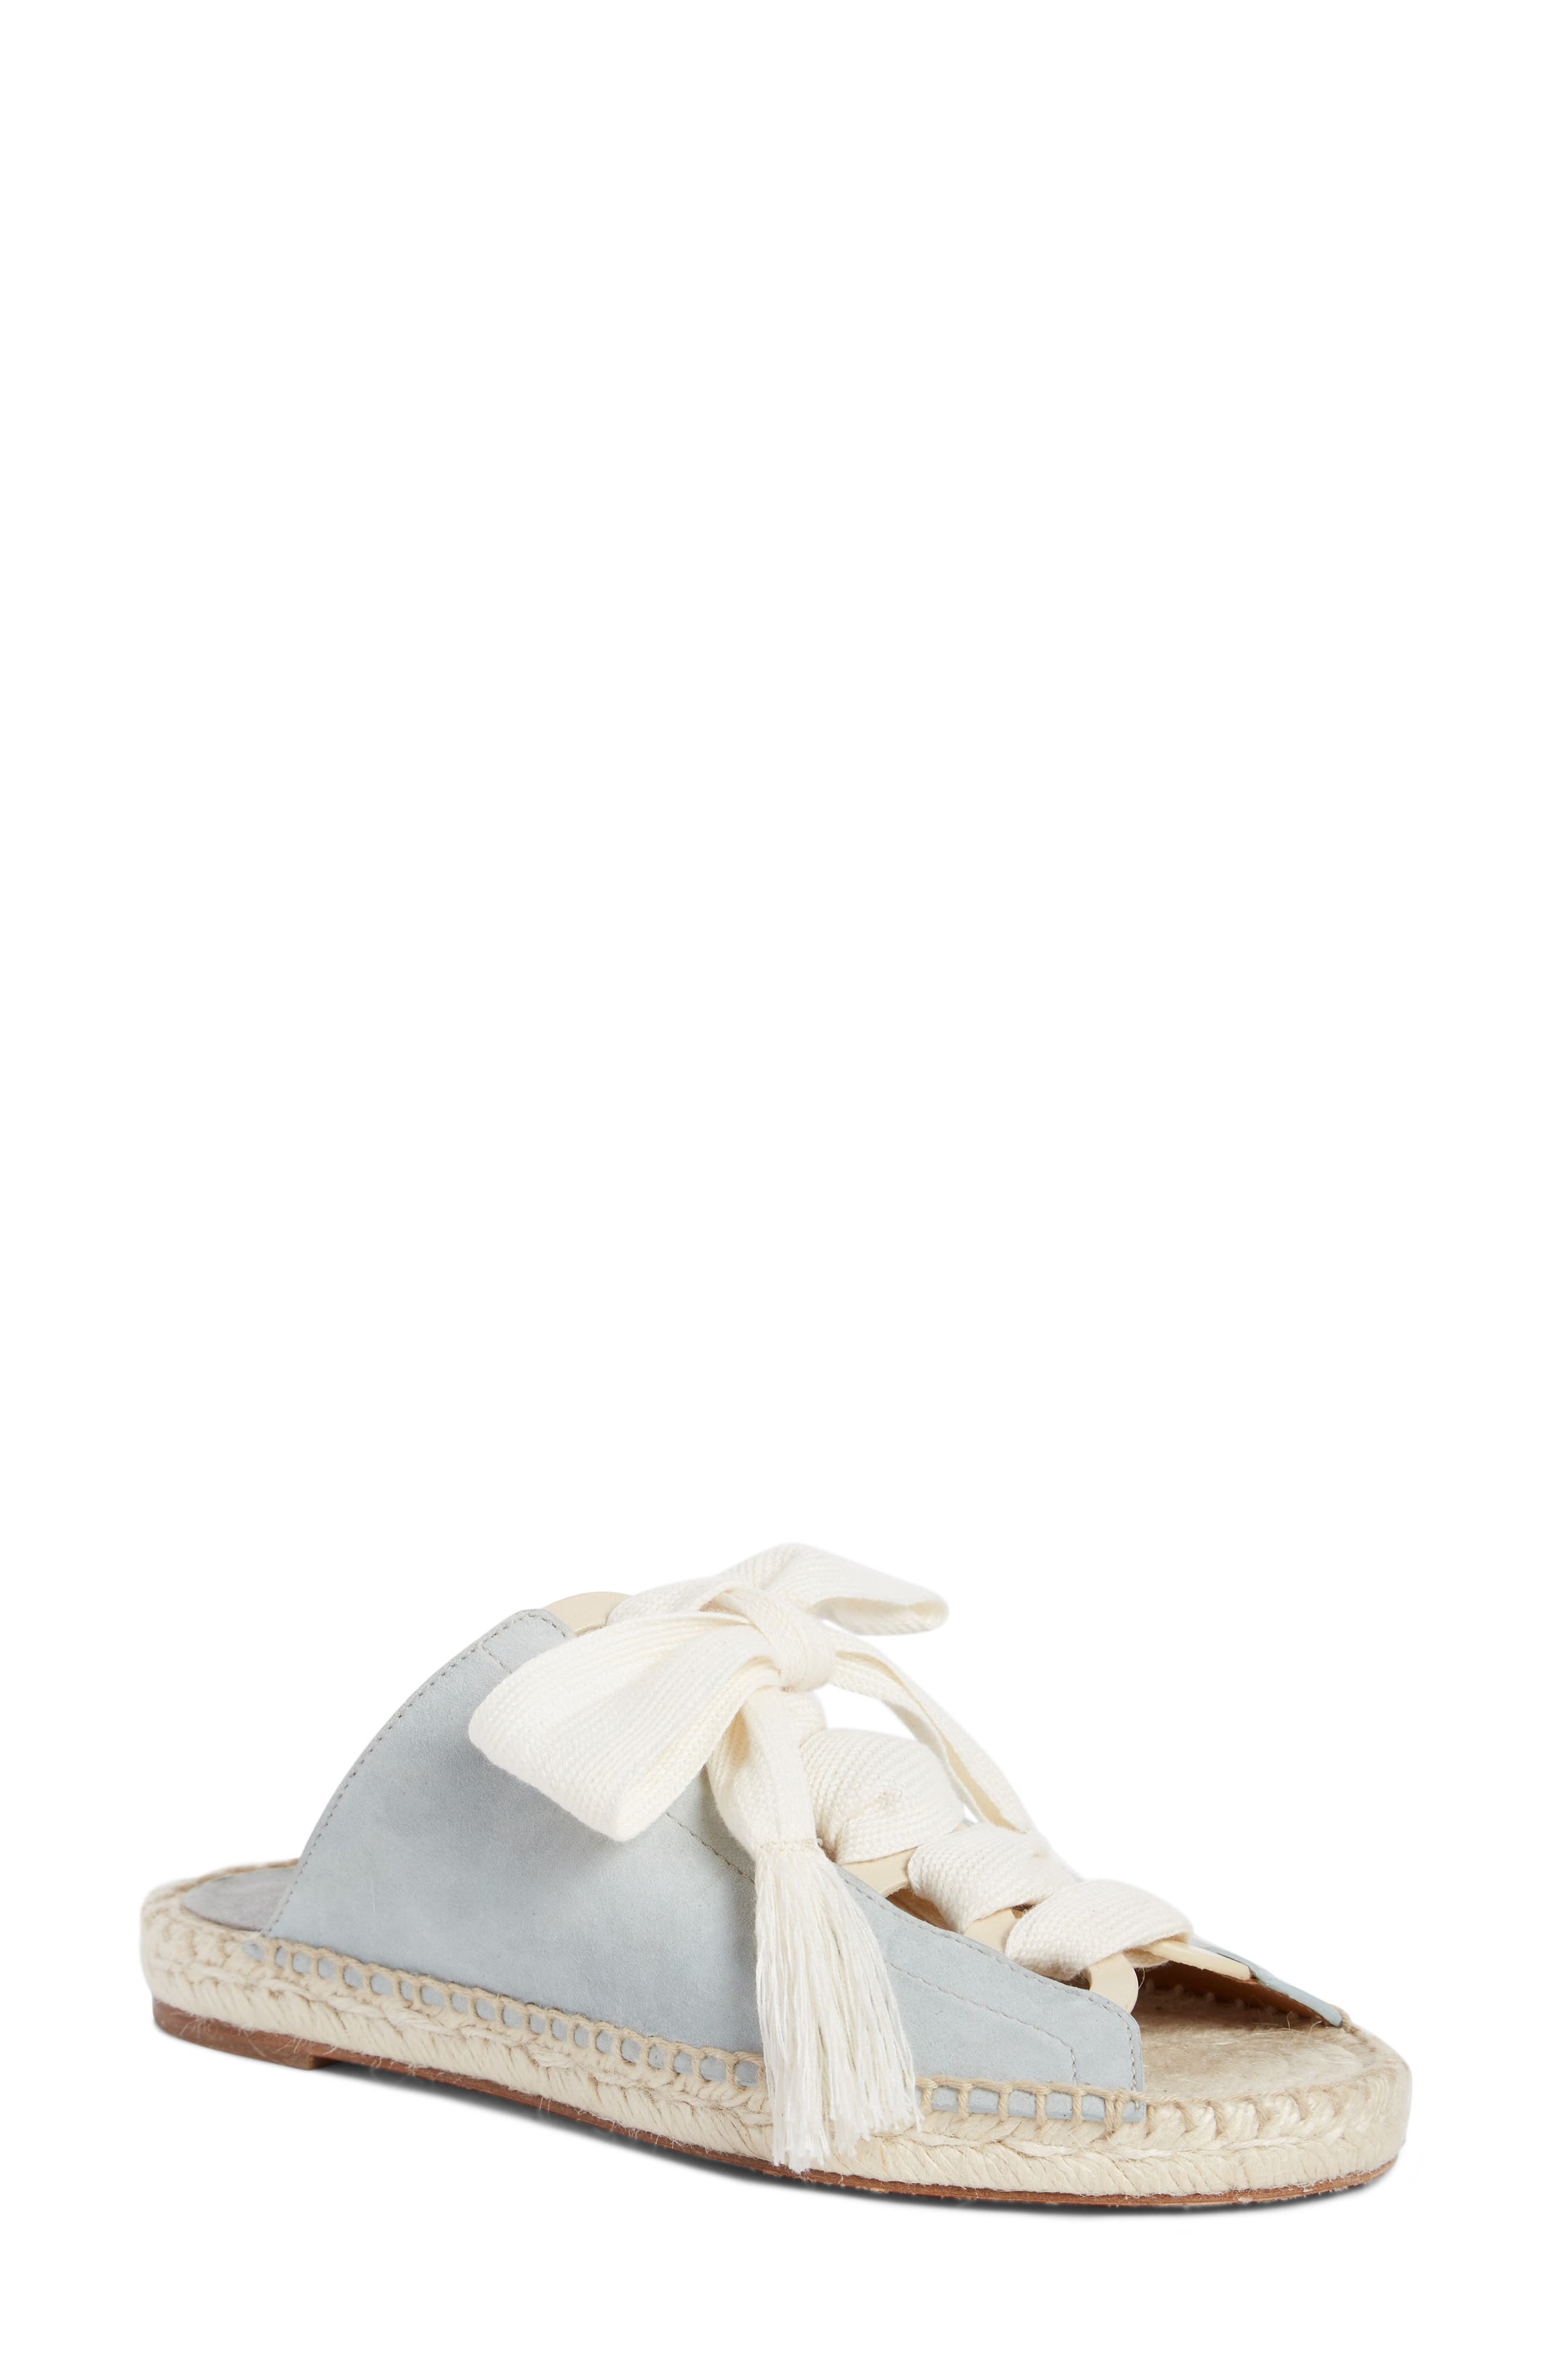 Harper Lace-Up Espadrille Slide Sandal,                             Main thumbnail 1, color,                             Aether Blue